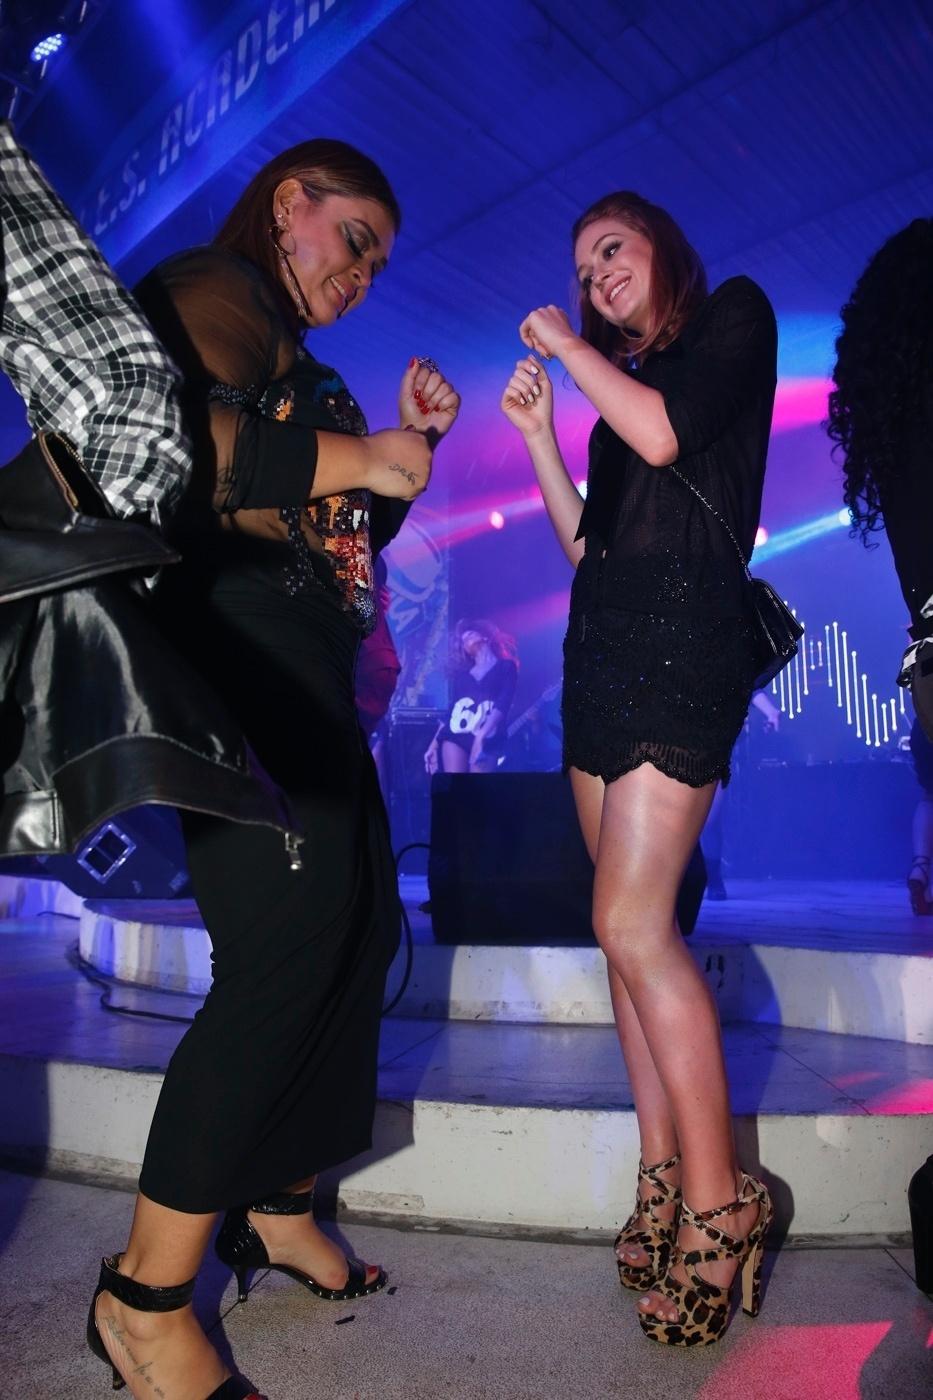 06.ago.2014- Preta Gil e Marina Ruy Barbosa se divertem ao som de funk